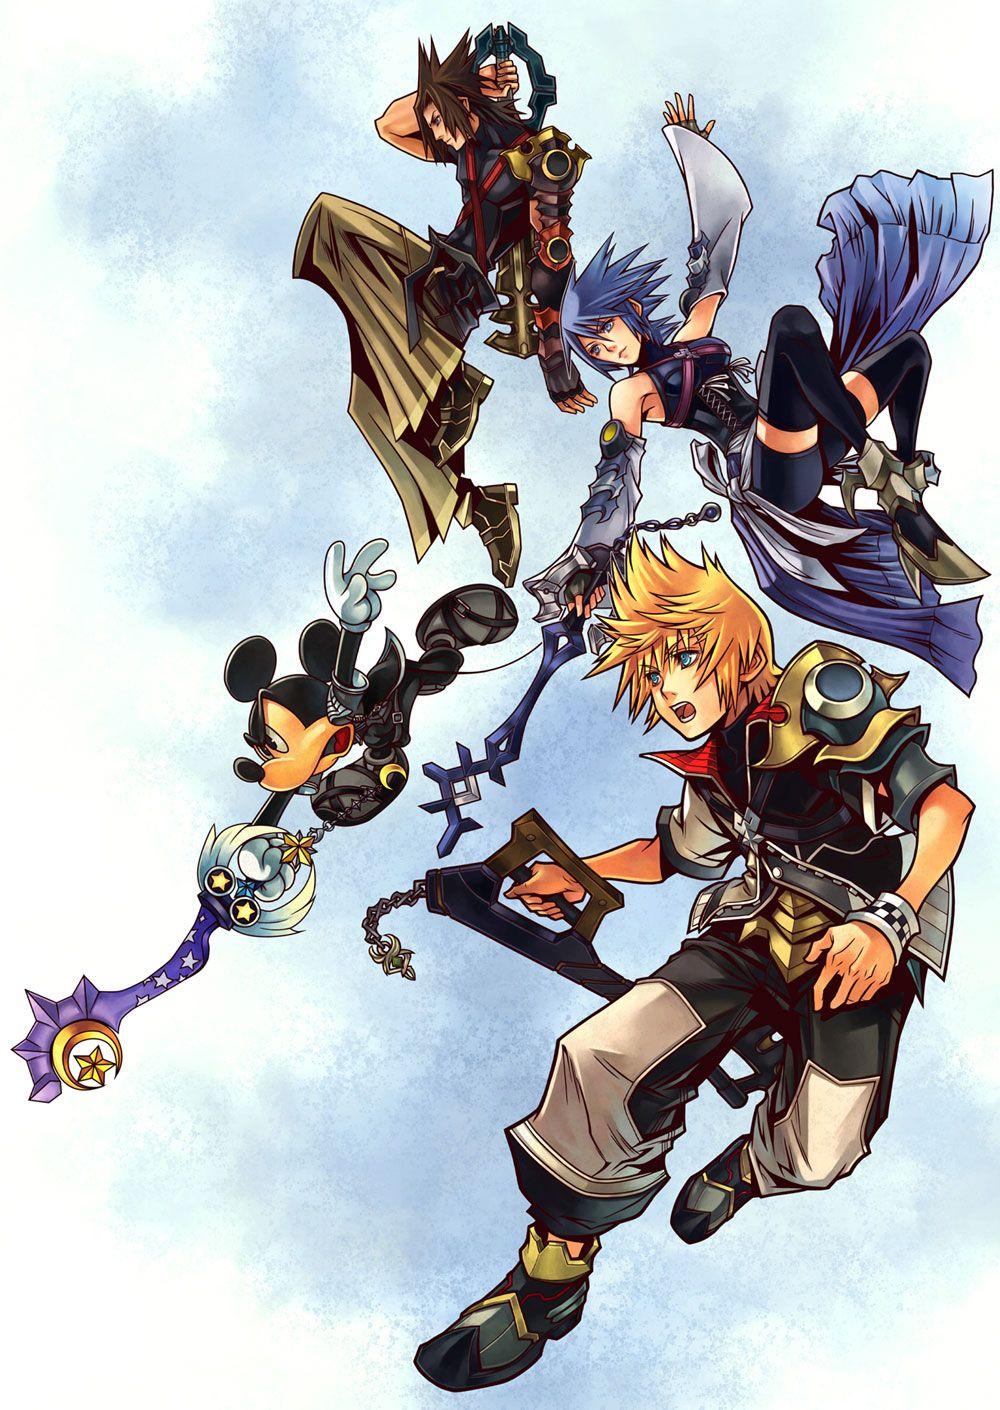 Kingdom Hearts: Birth by Sleep - Main Illustration | Video ...